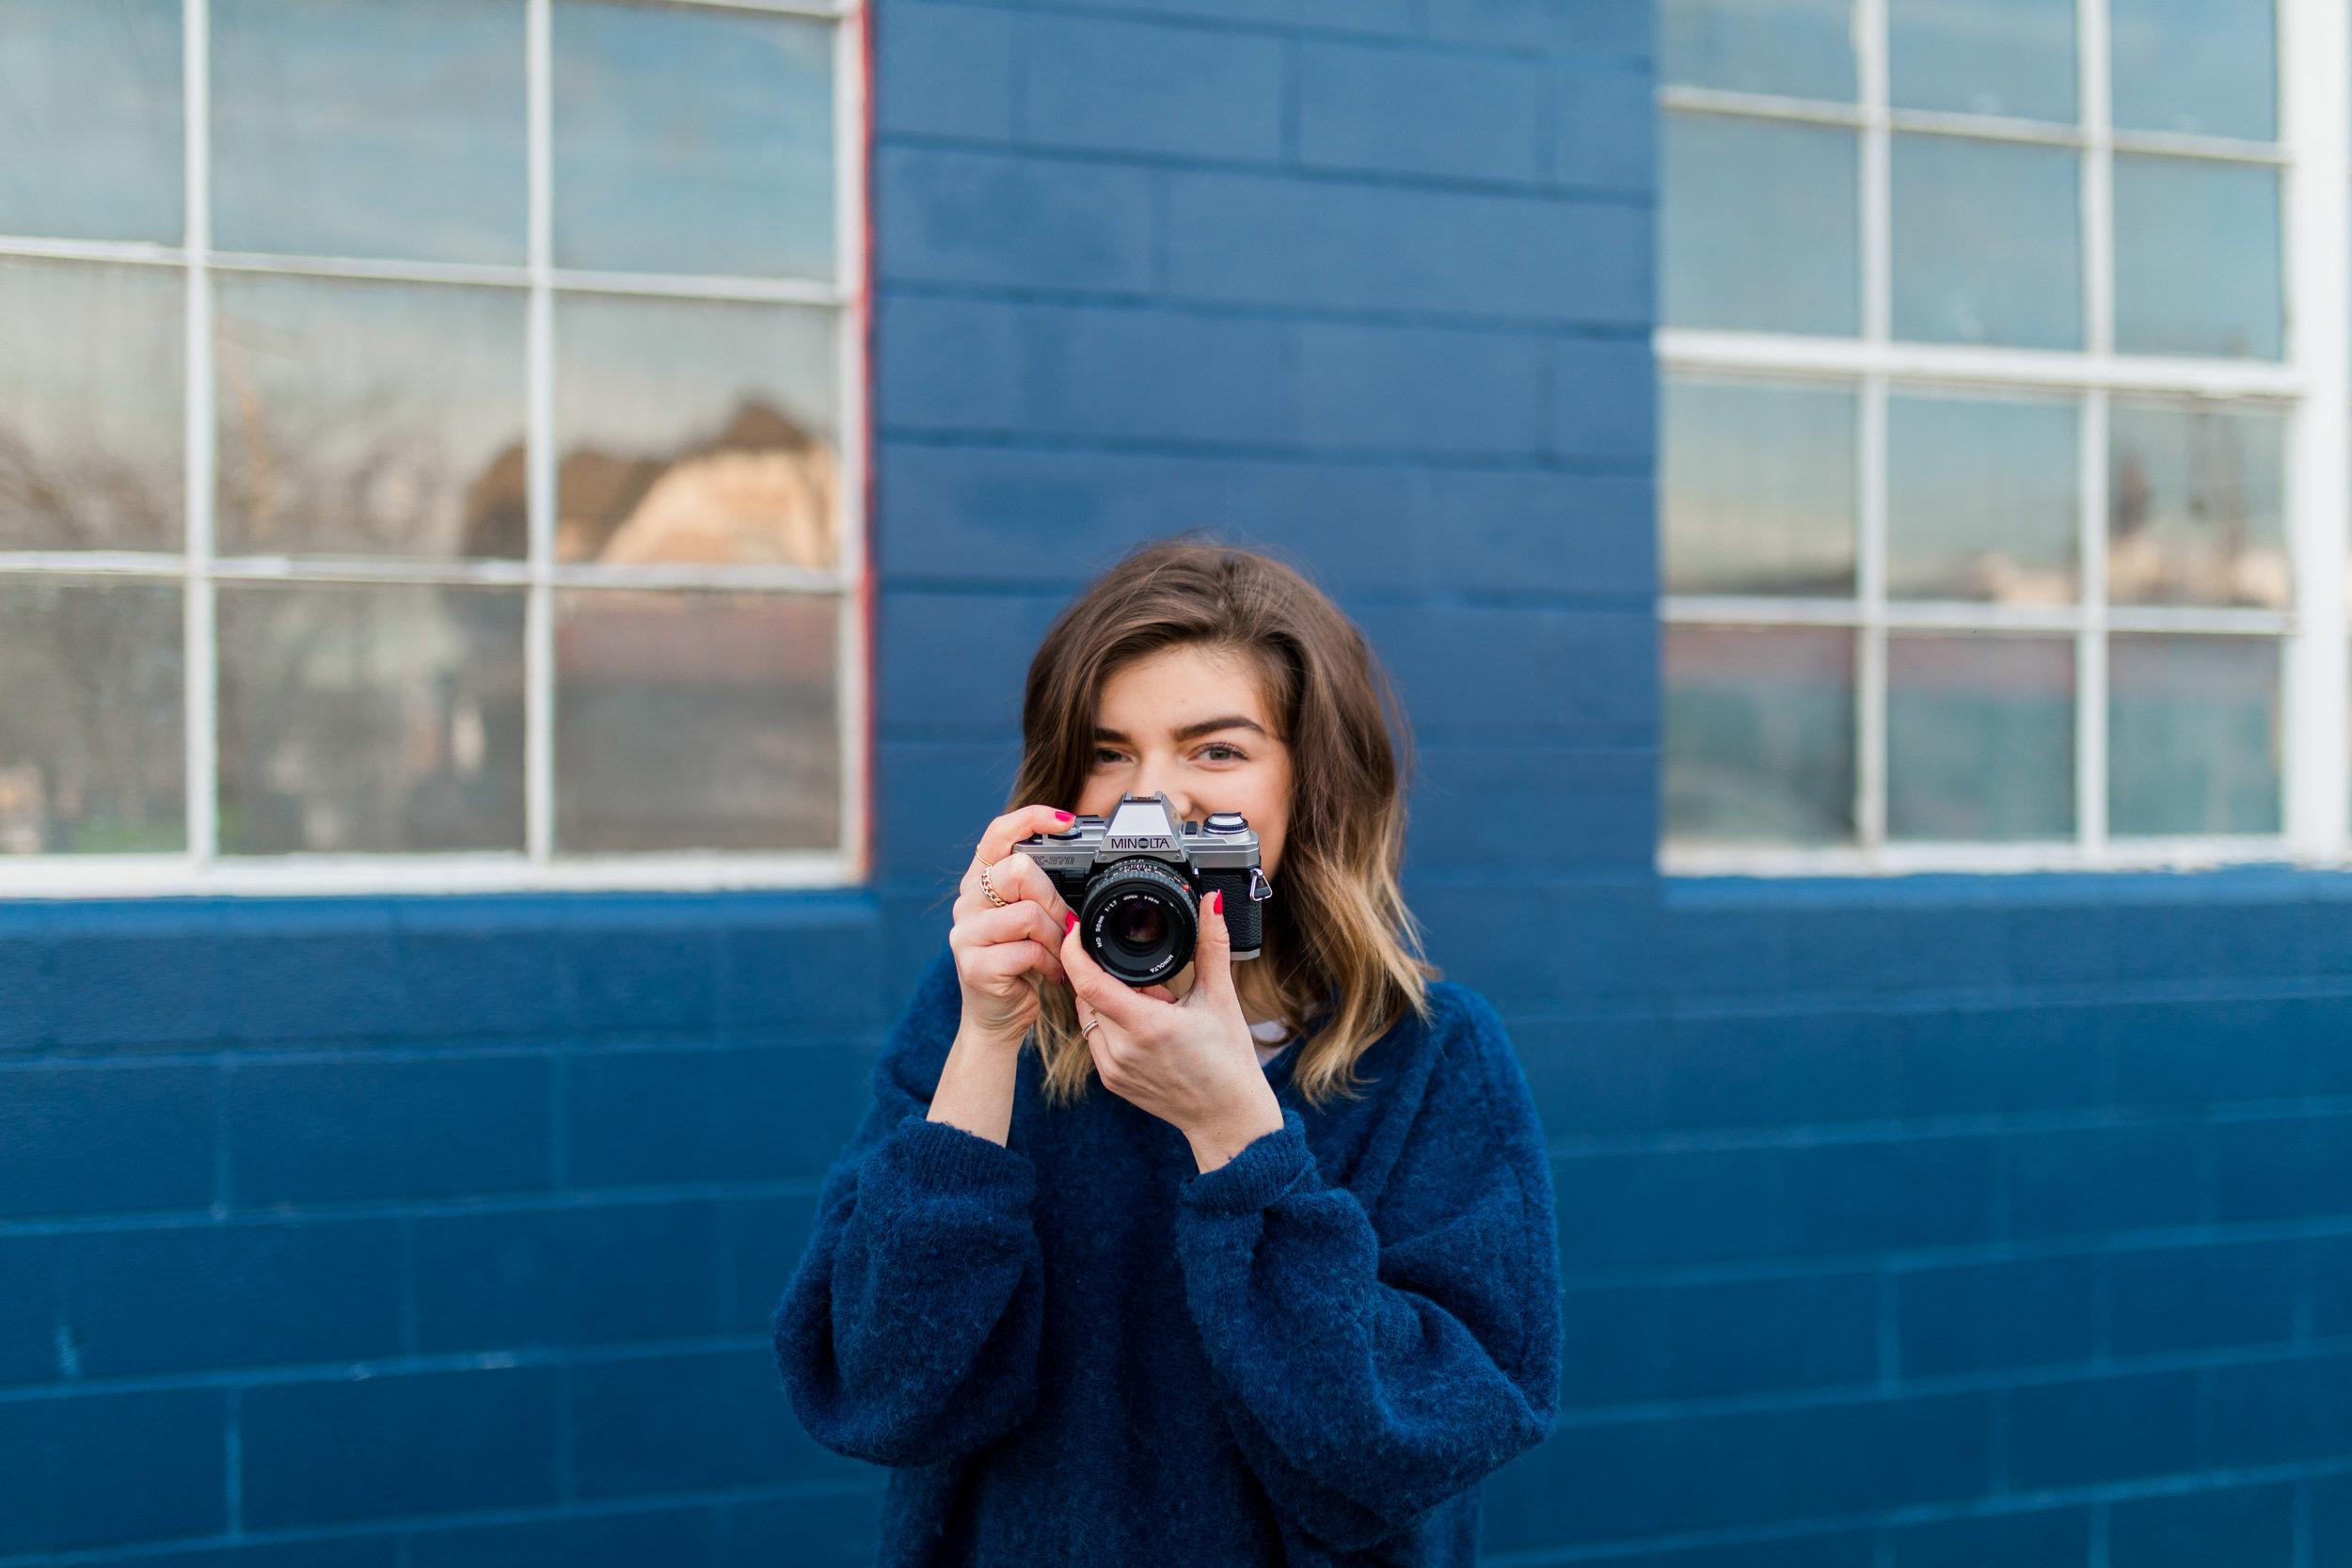 newyorkcity_photographer_ (7 of 12).jpg